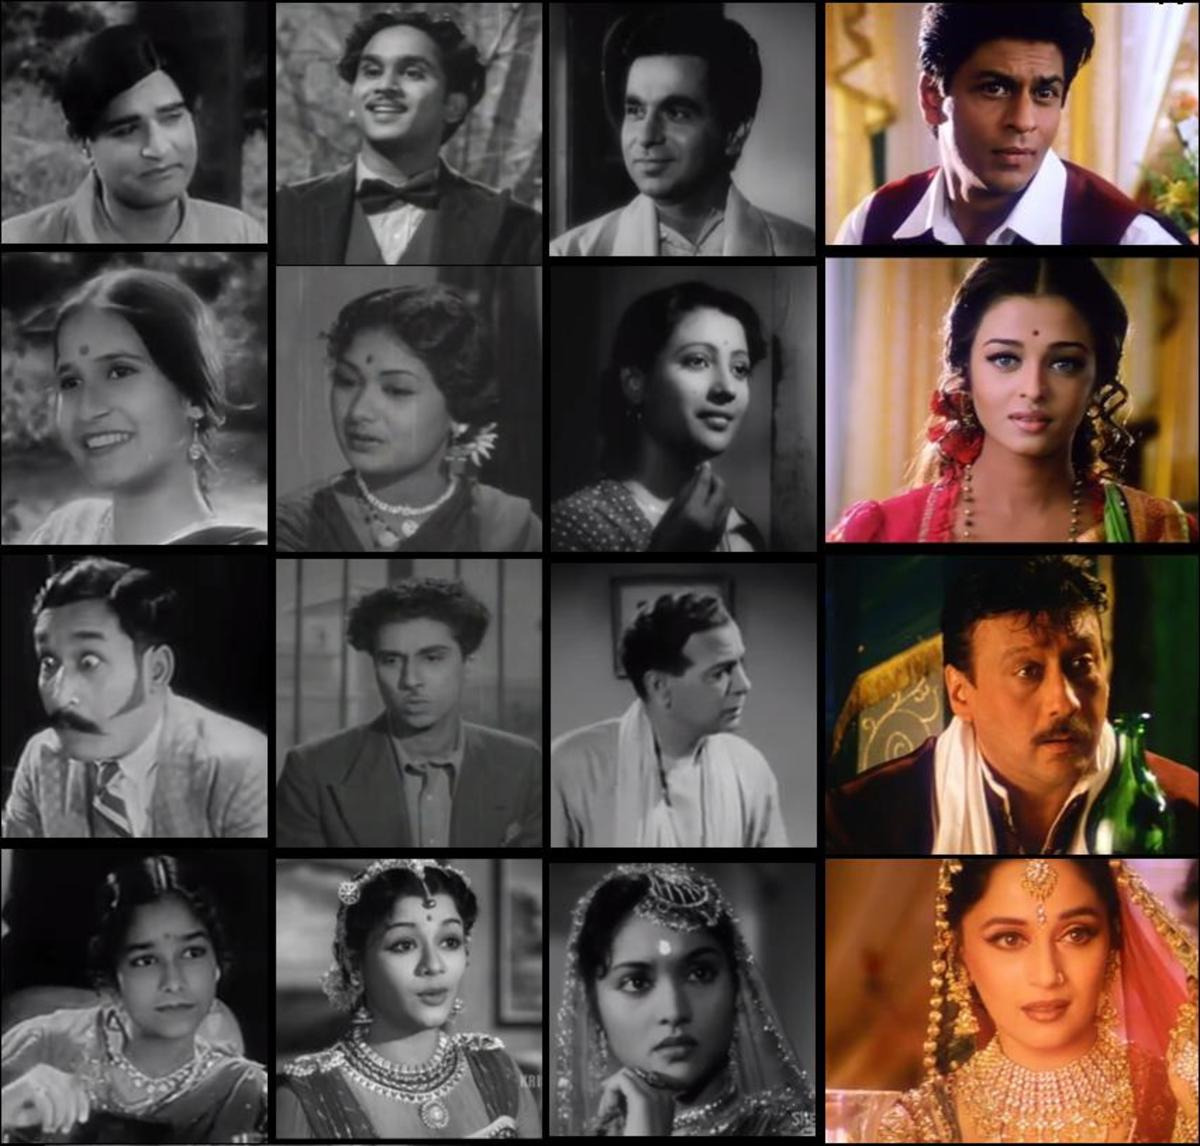 Devdas, Parvathi, Chunnilal / Bhagawan and Chandramukhi from 1936, 1953, 1955 and 2002